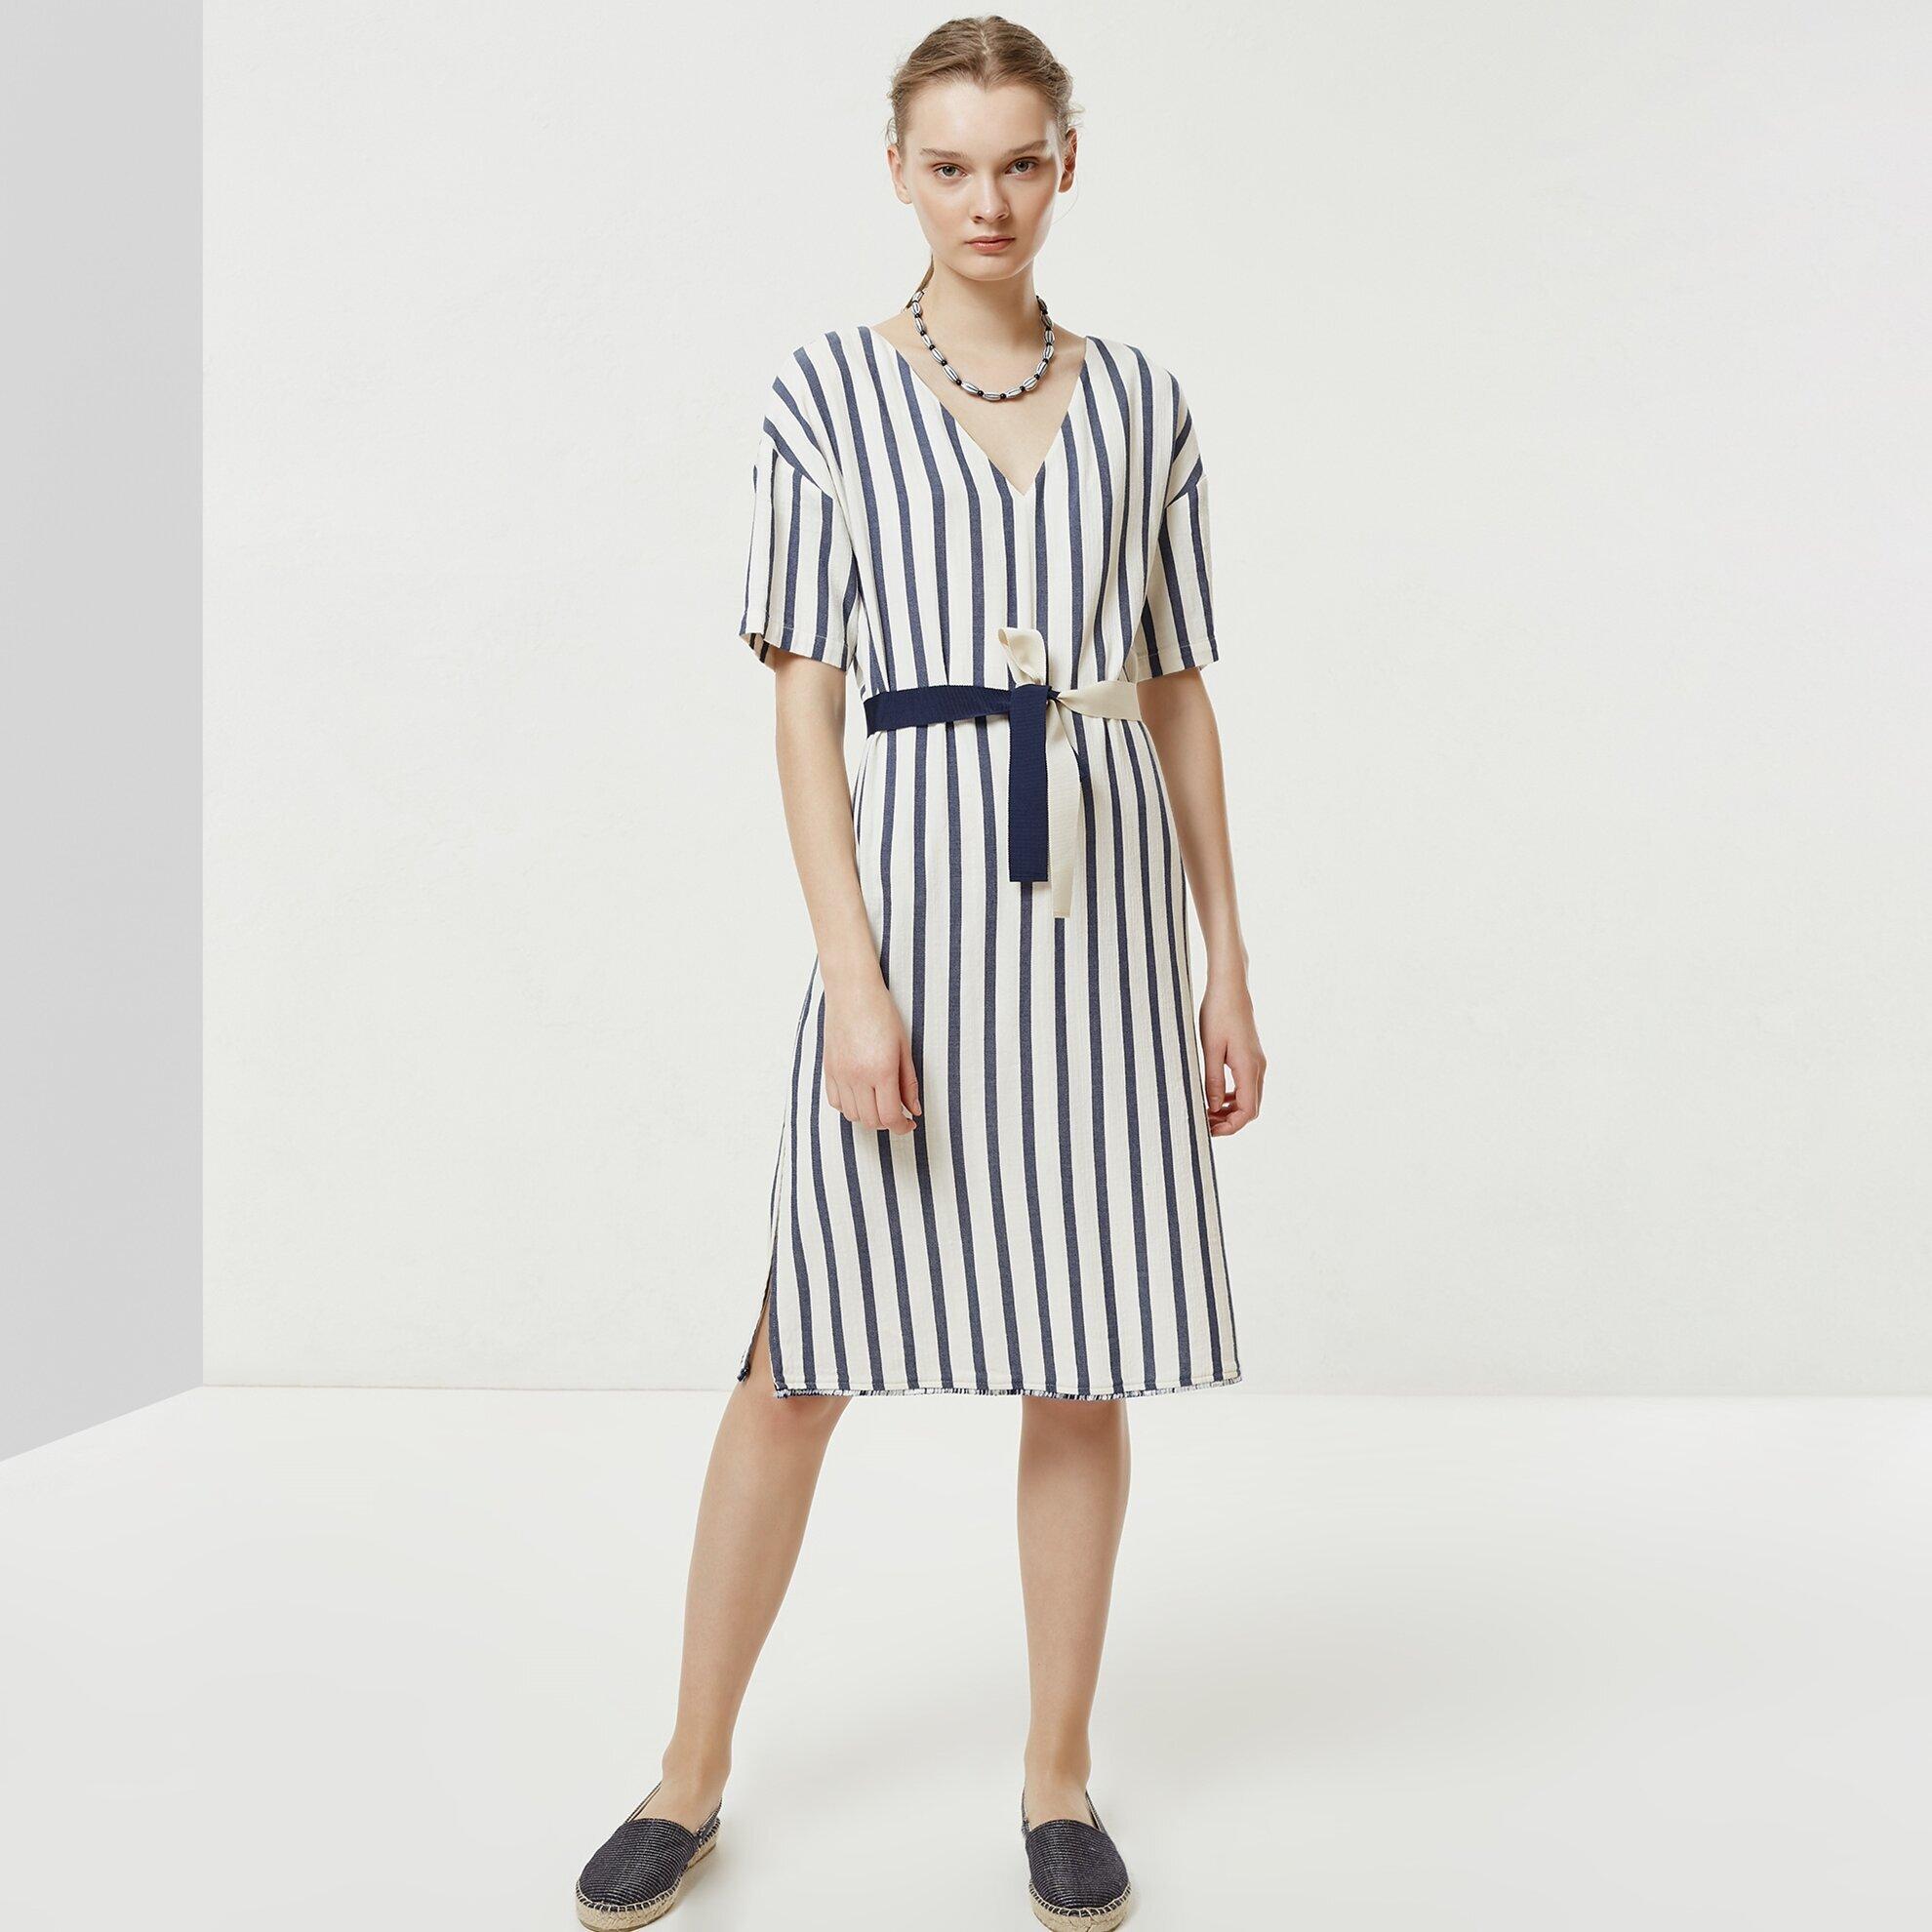 V Yaka Kısa Kollu Elbise